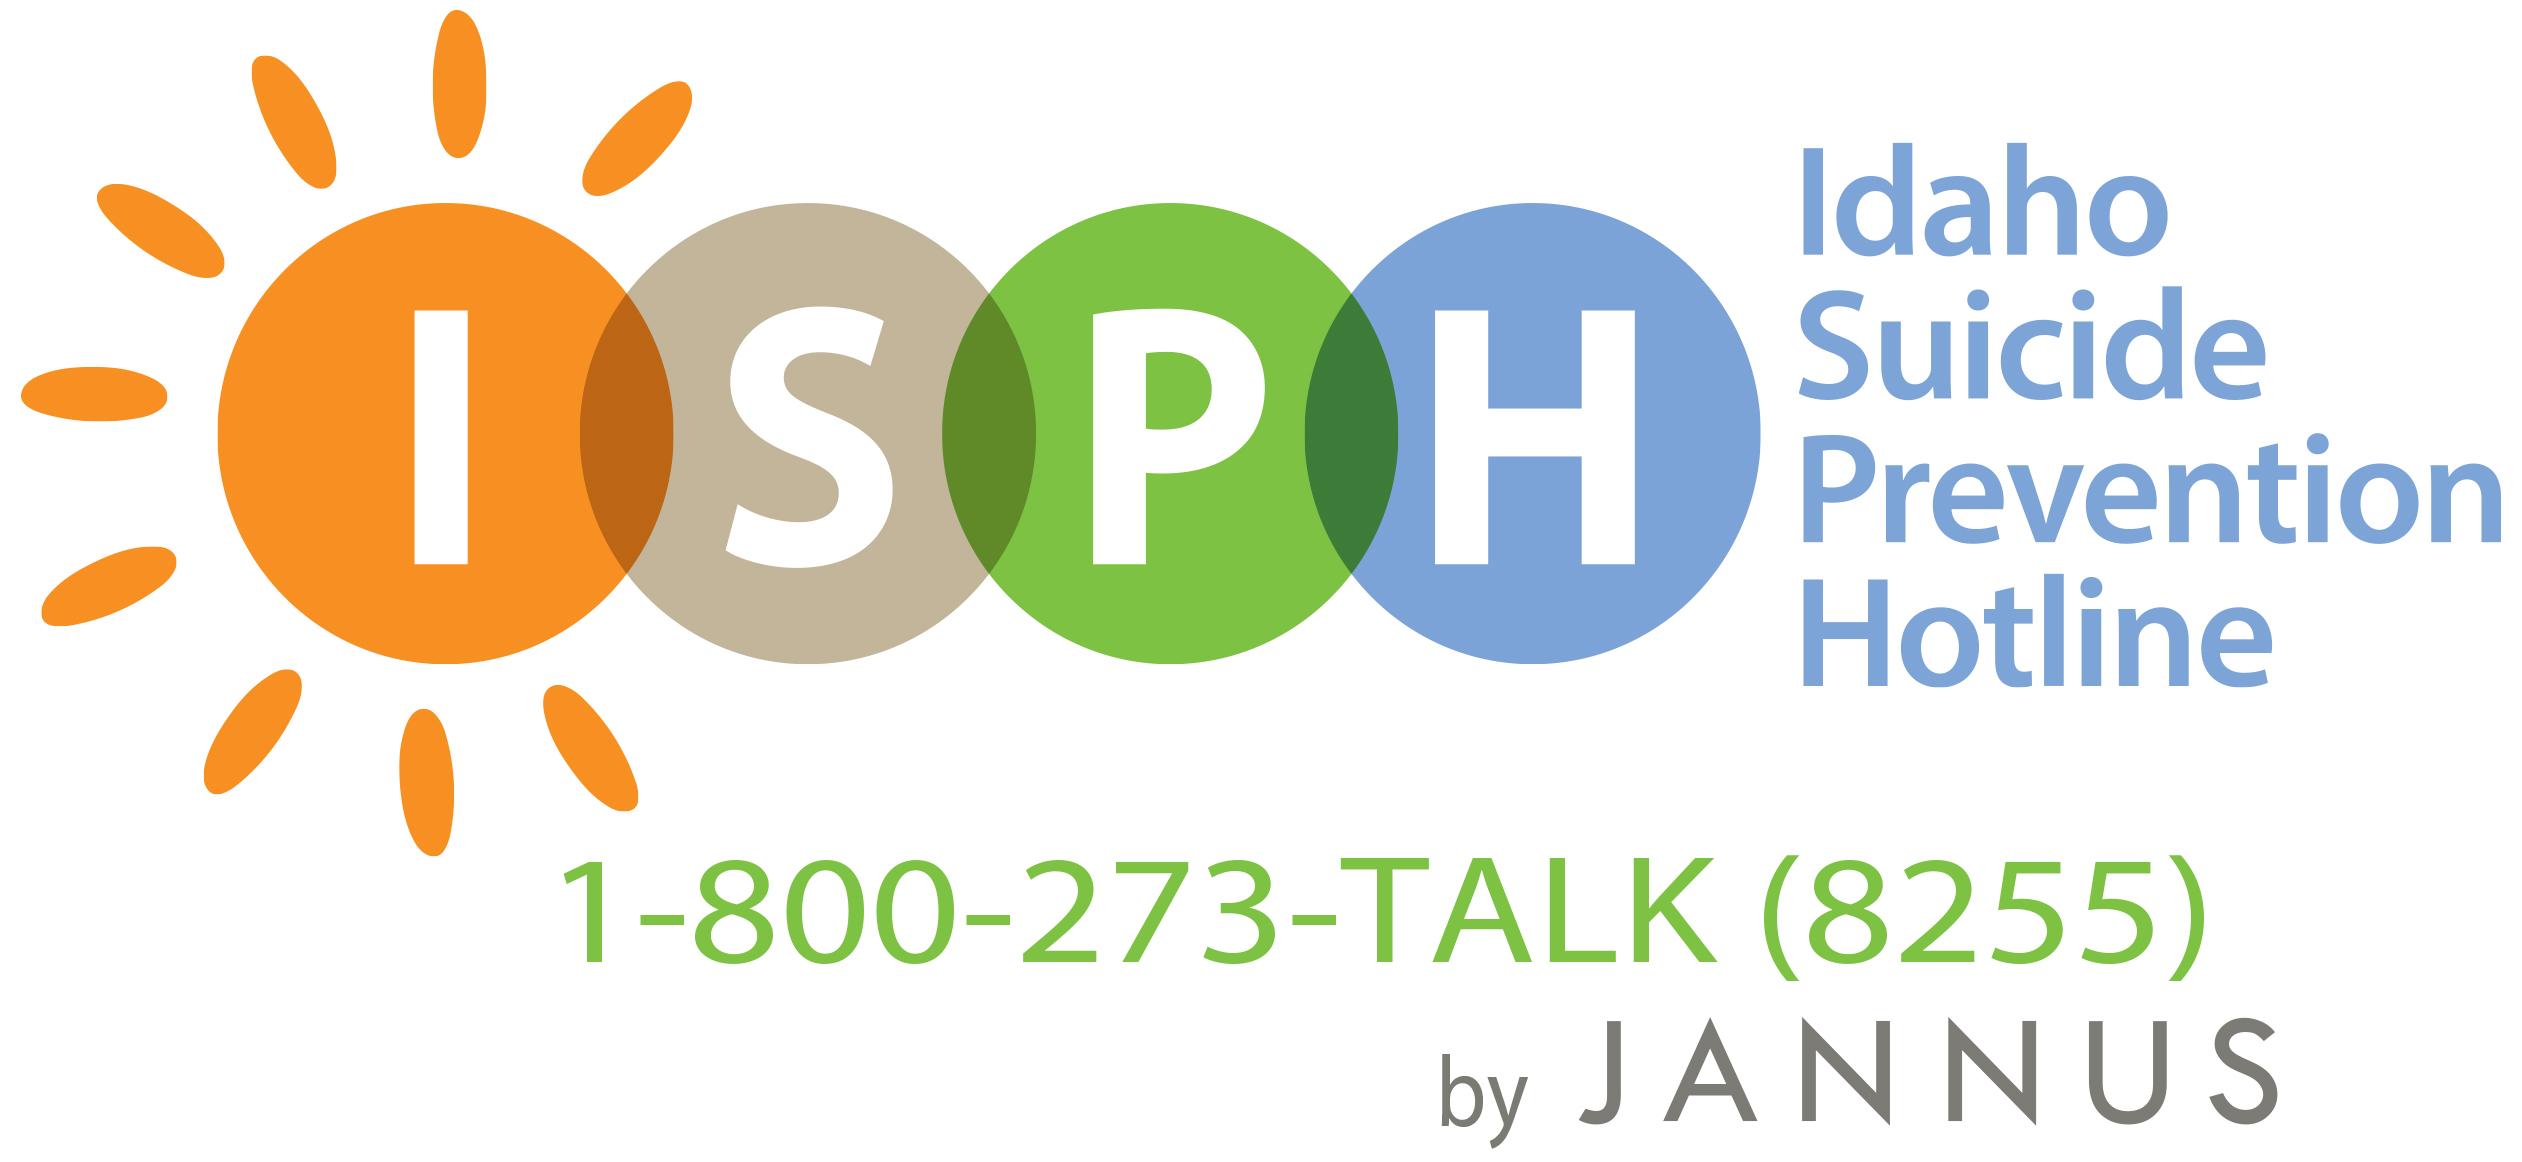 Idaho Suicide Prevention Hotline